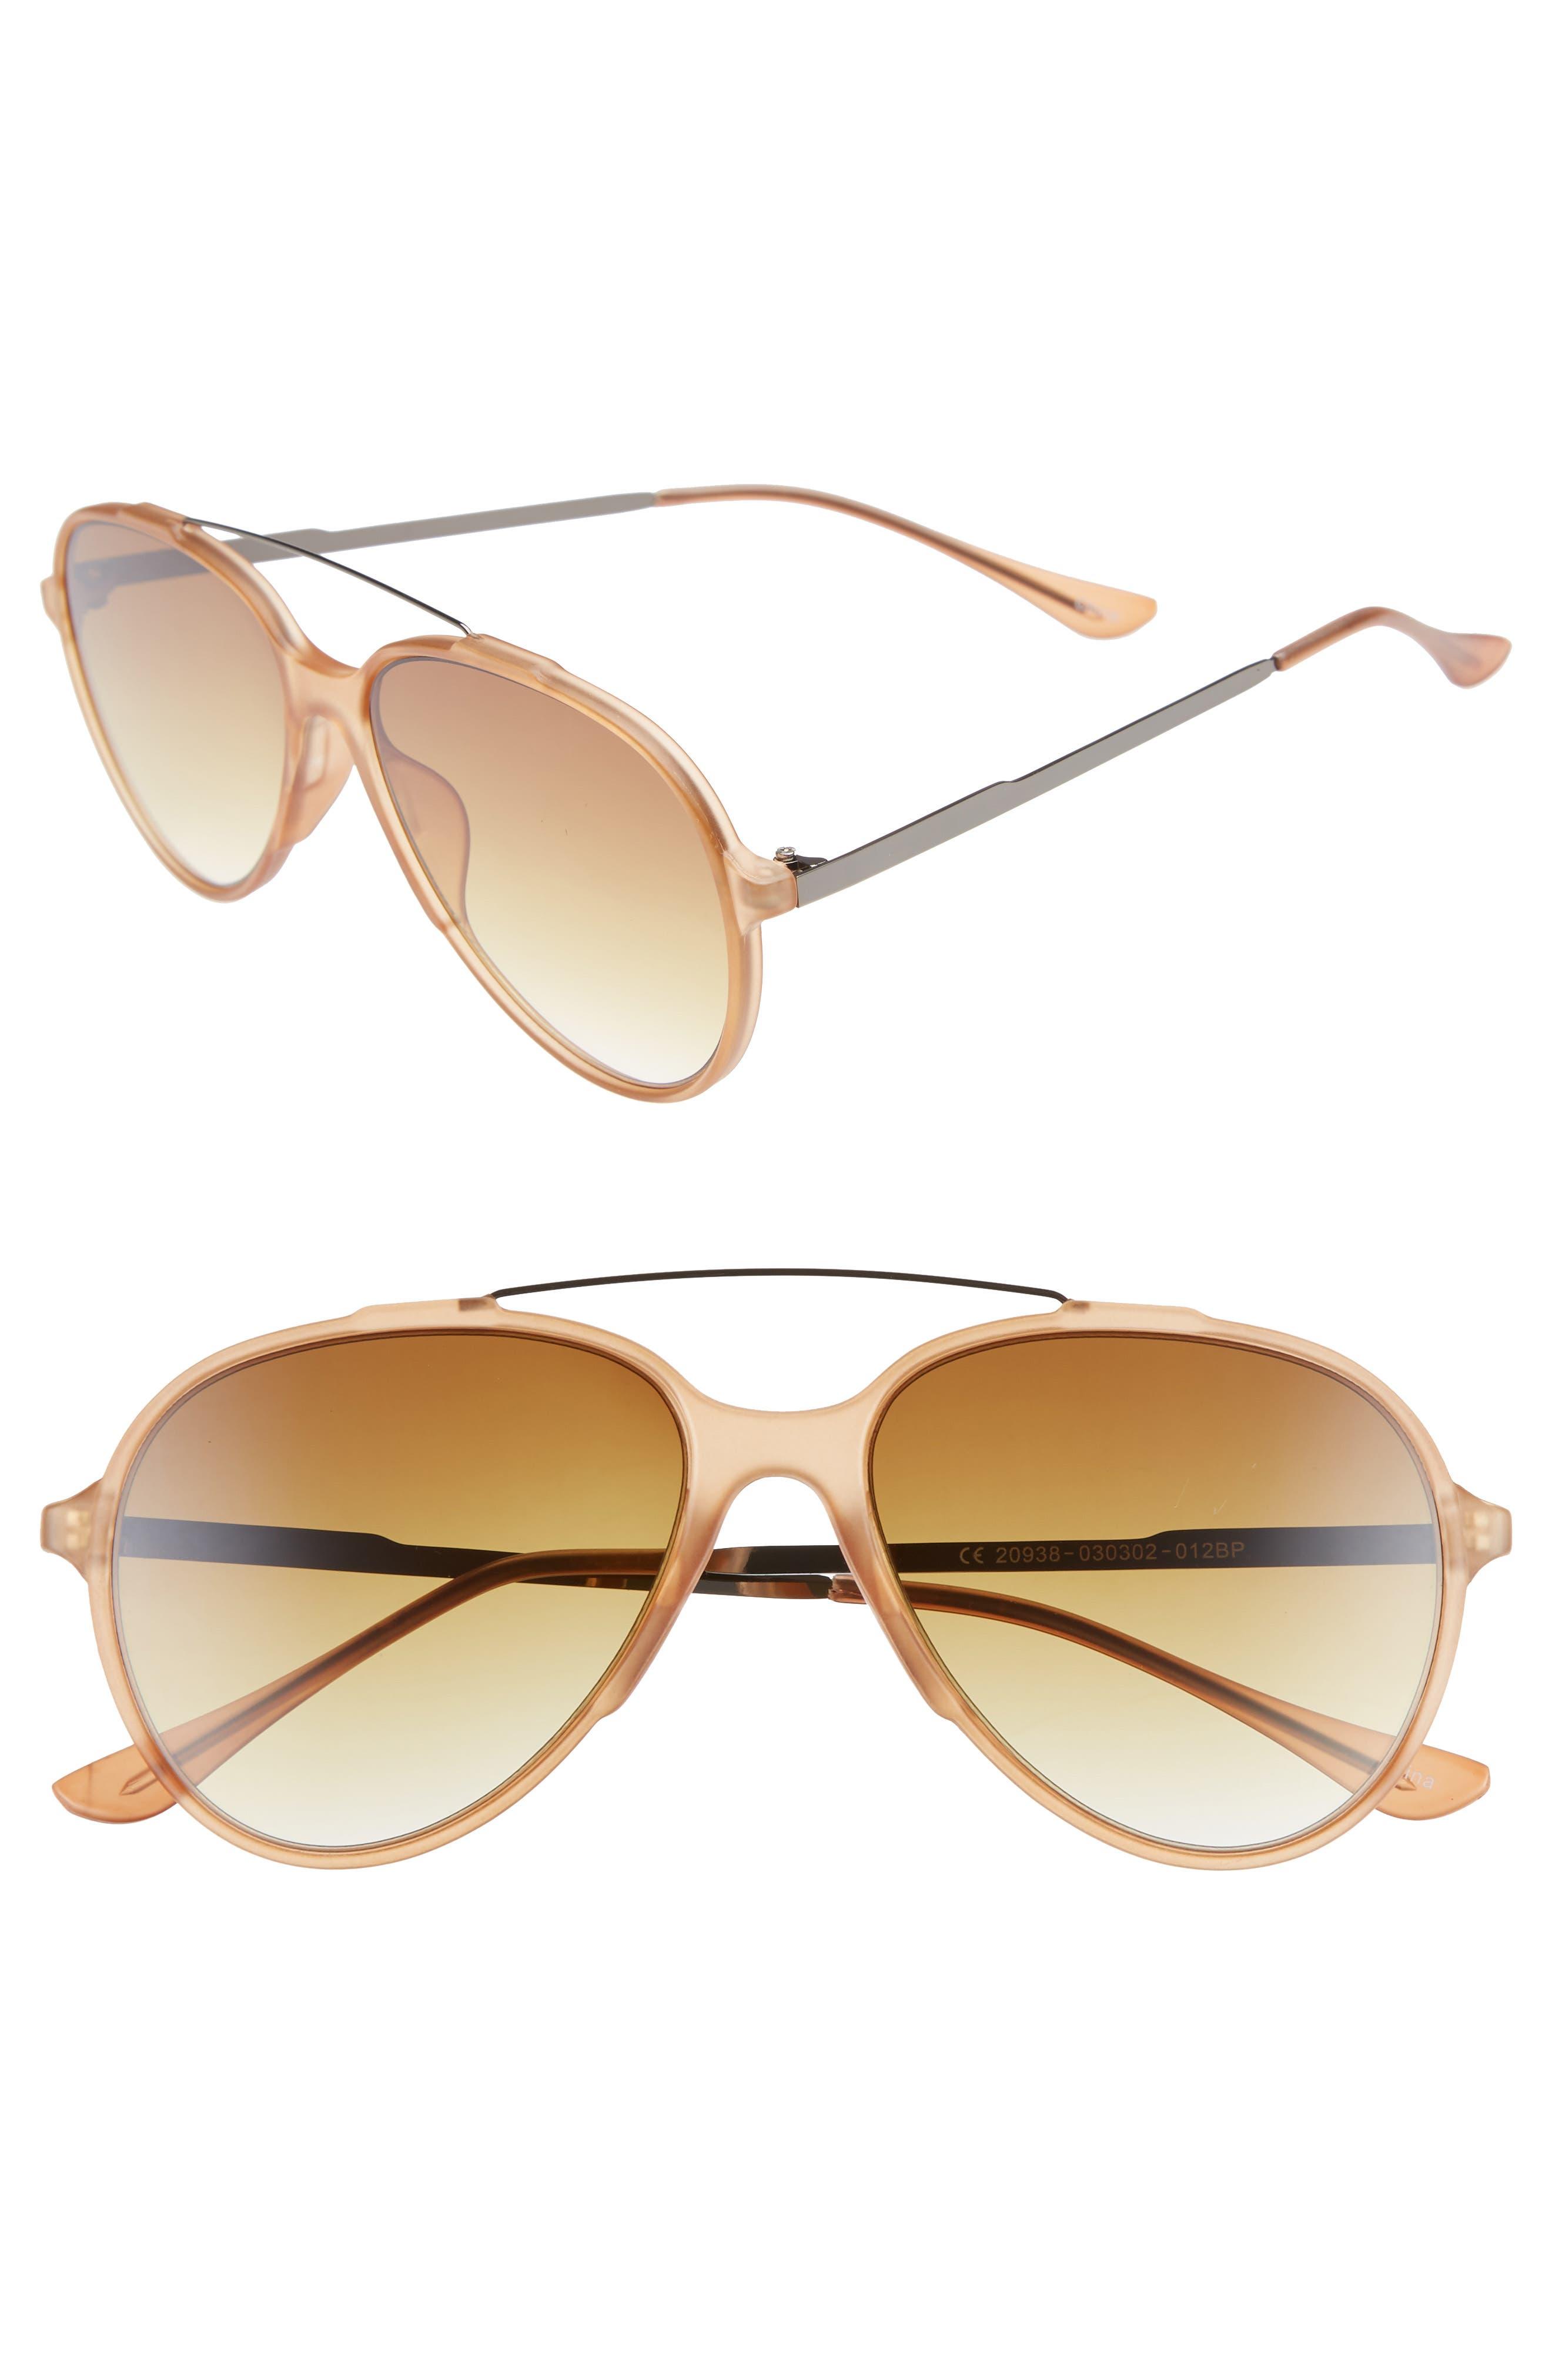 55mm Aviator Sunglasses,                             Main thumbnail 1, color,                             BROWN